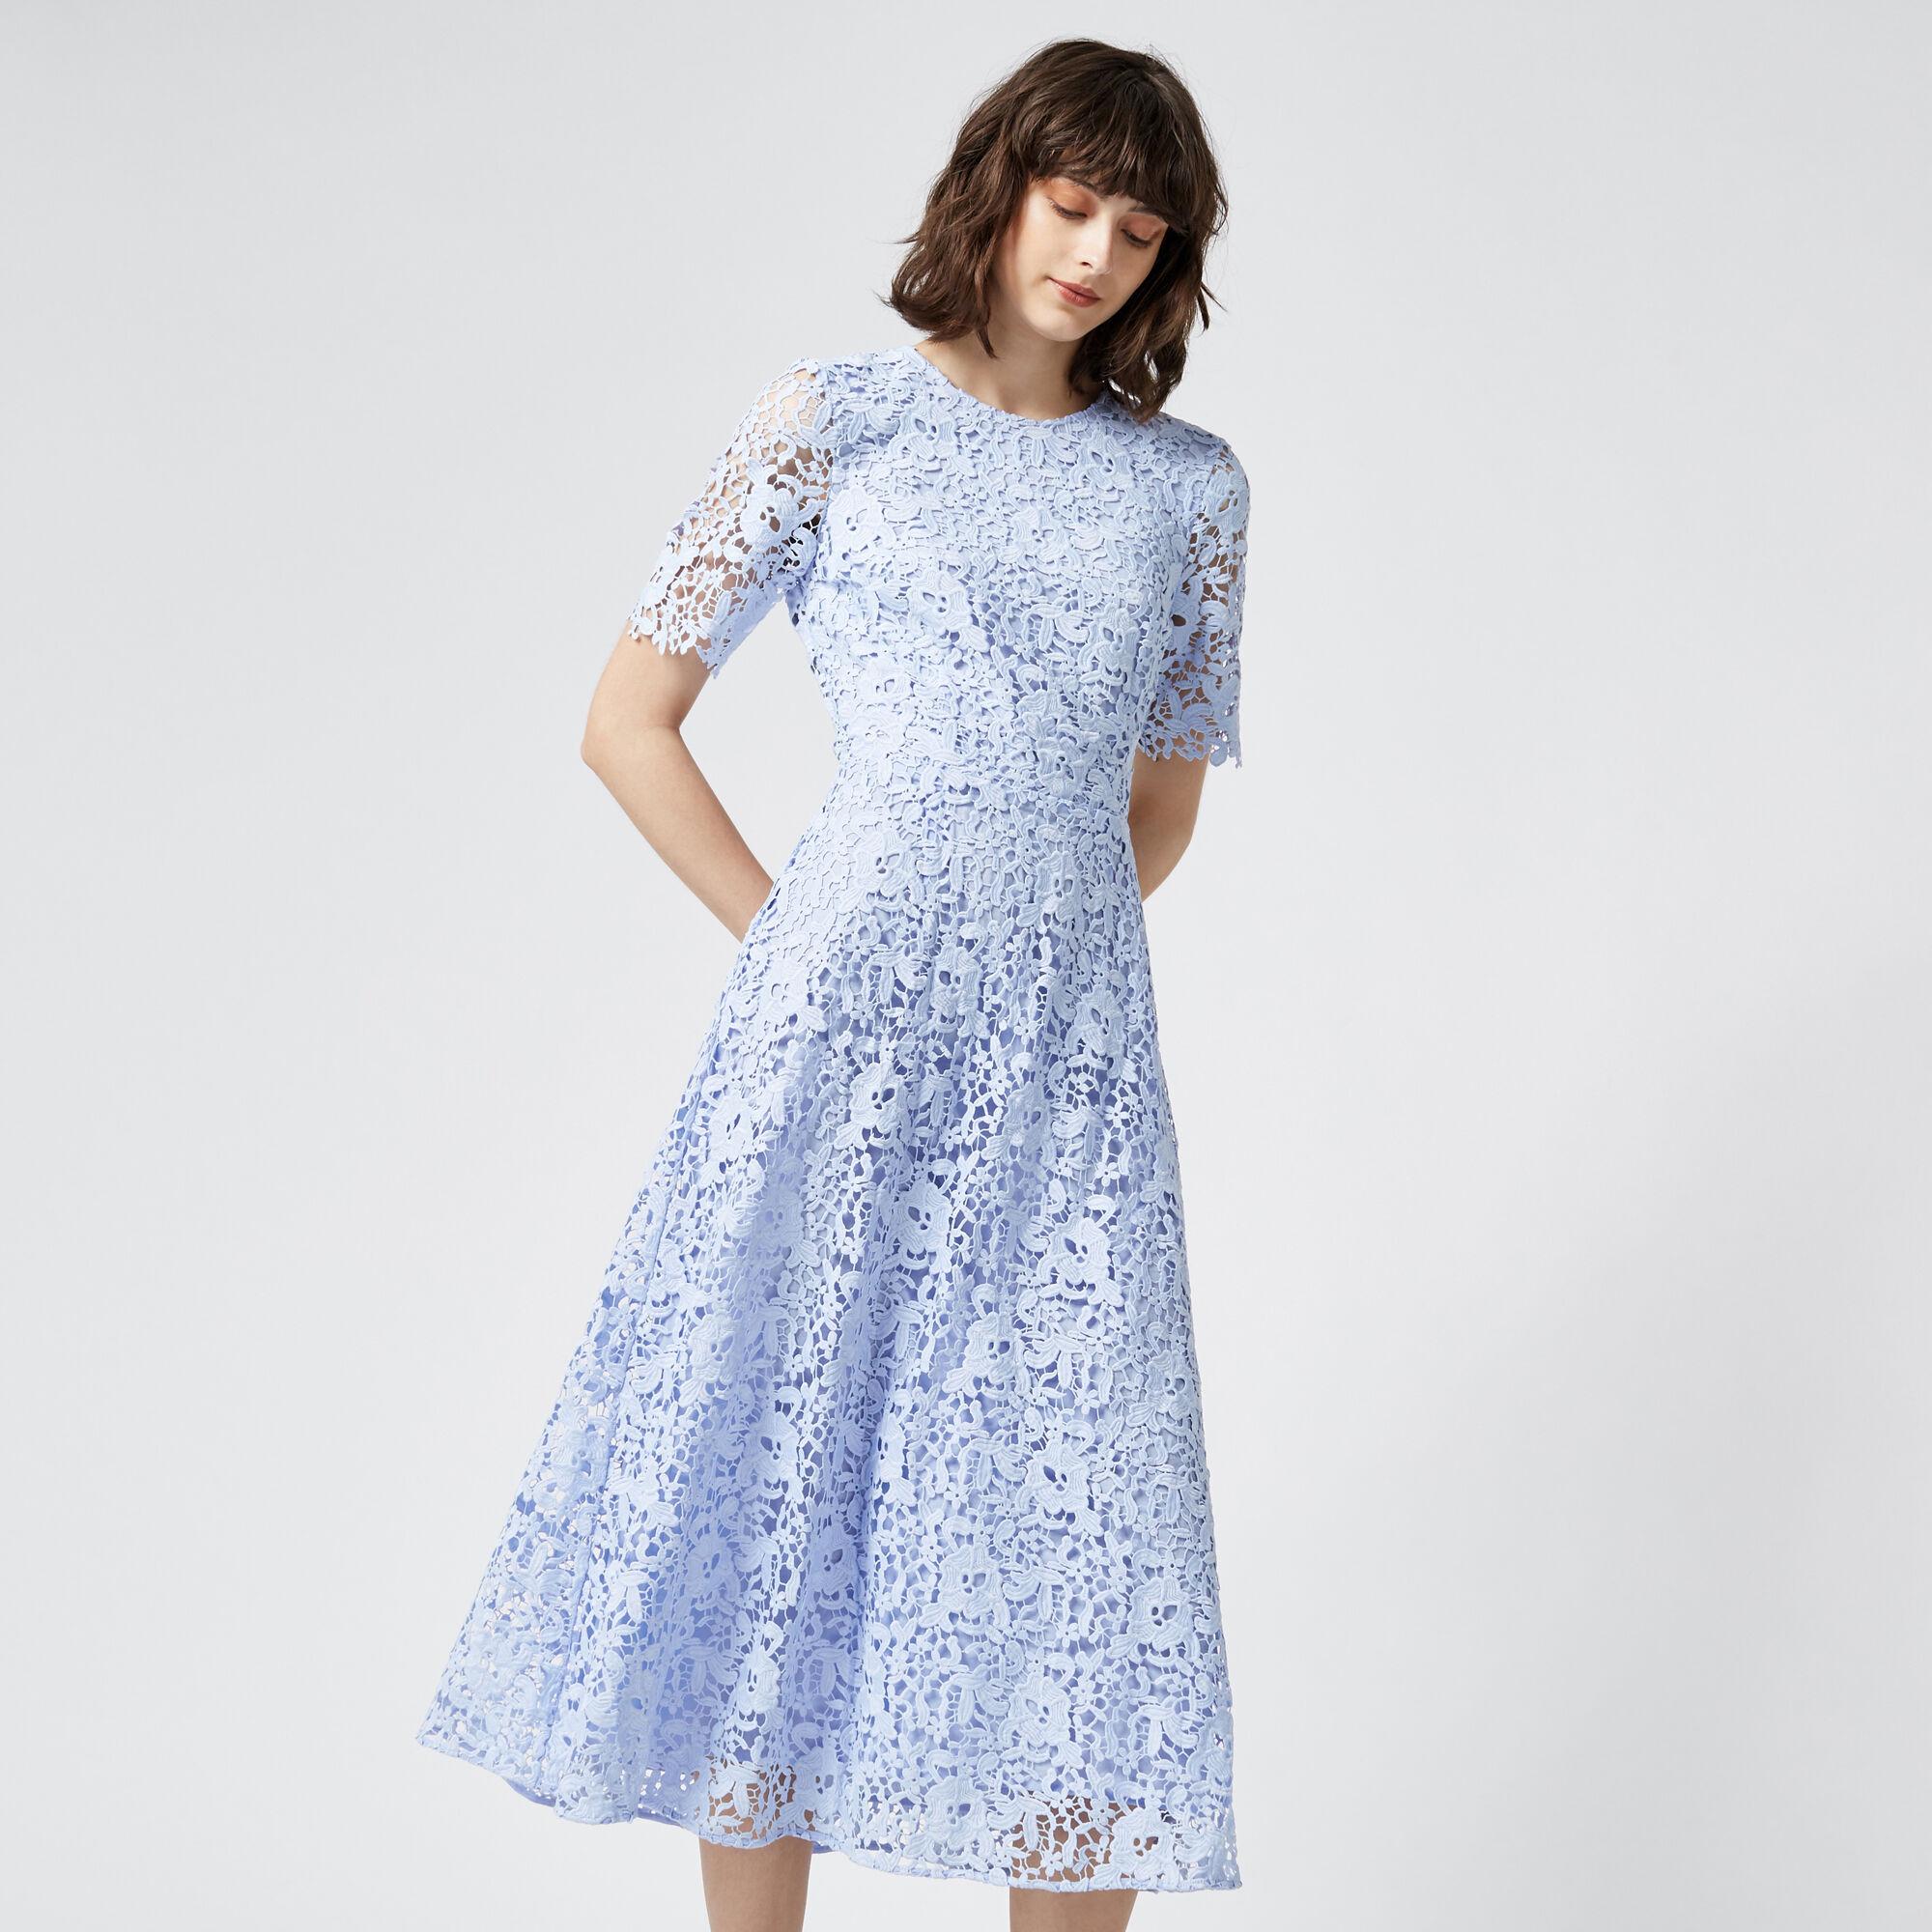 Warehouse, PREMIUM LACE SLEEVE DRESS Light Blue 1